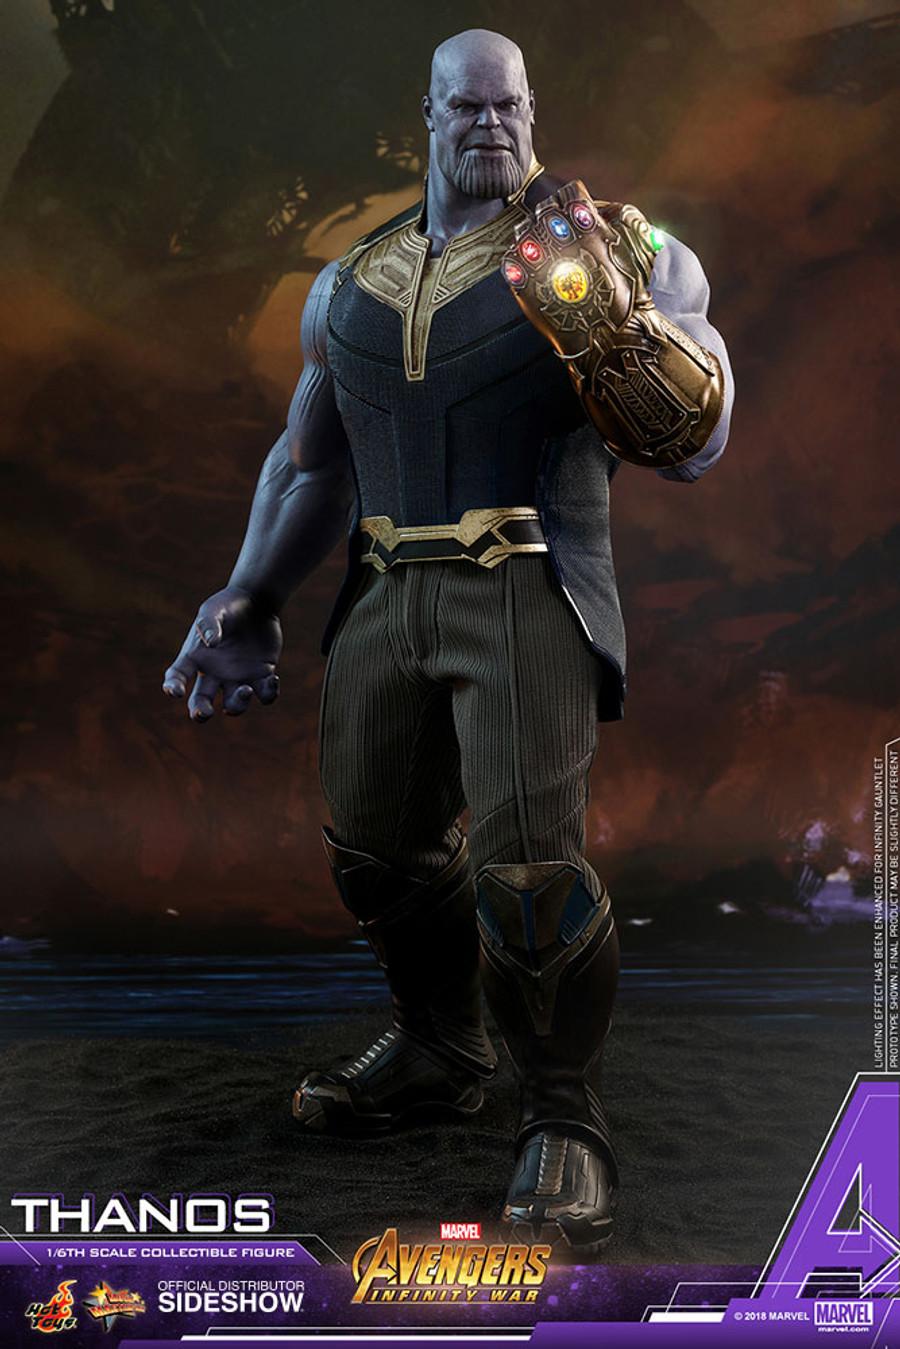 Hot Toys - Avengers: Infinity War - Thanos